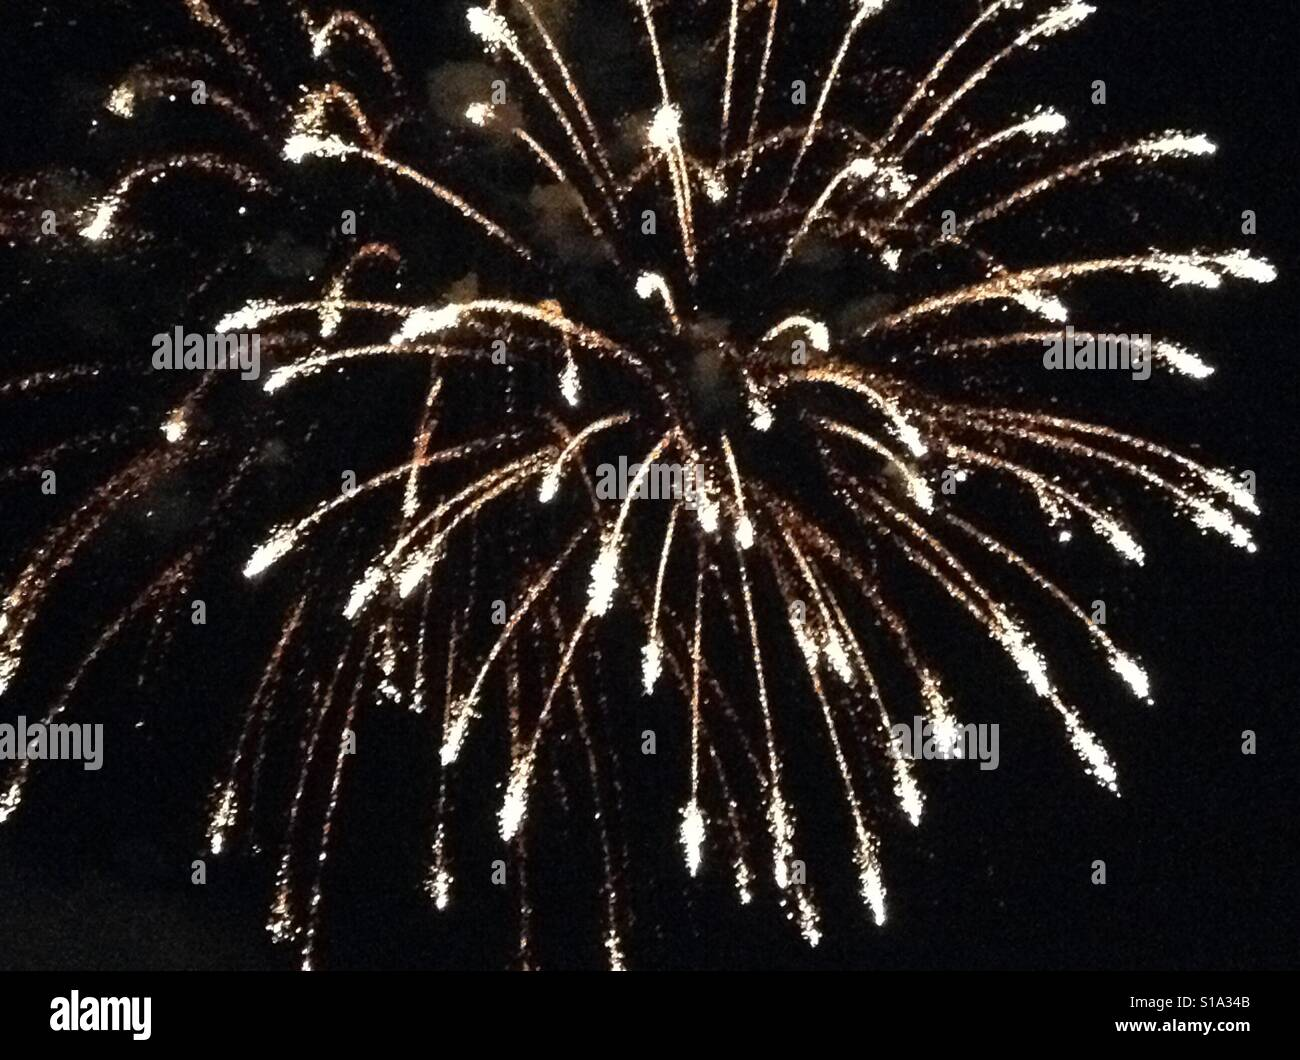 Bursting sparkling night fireworks - Stock Image